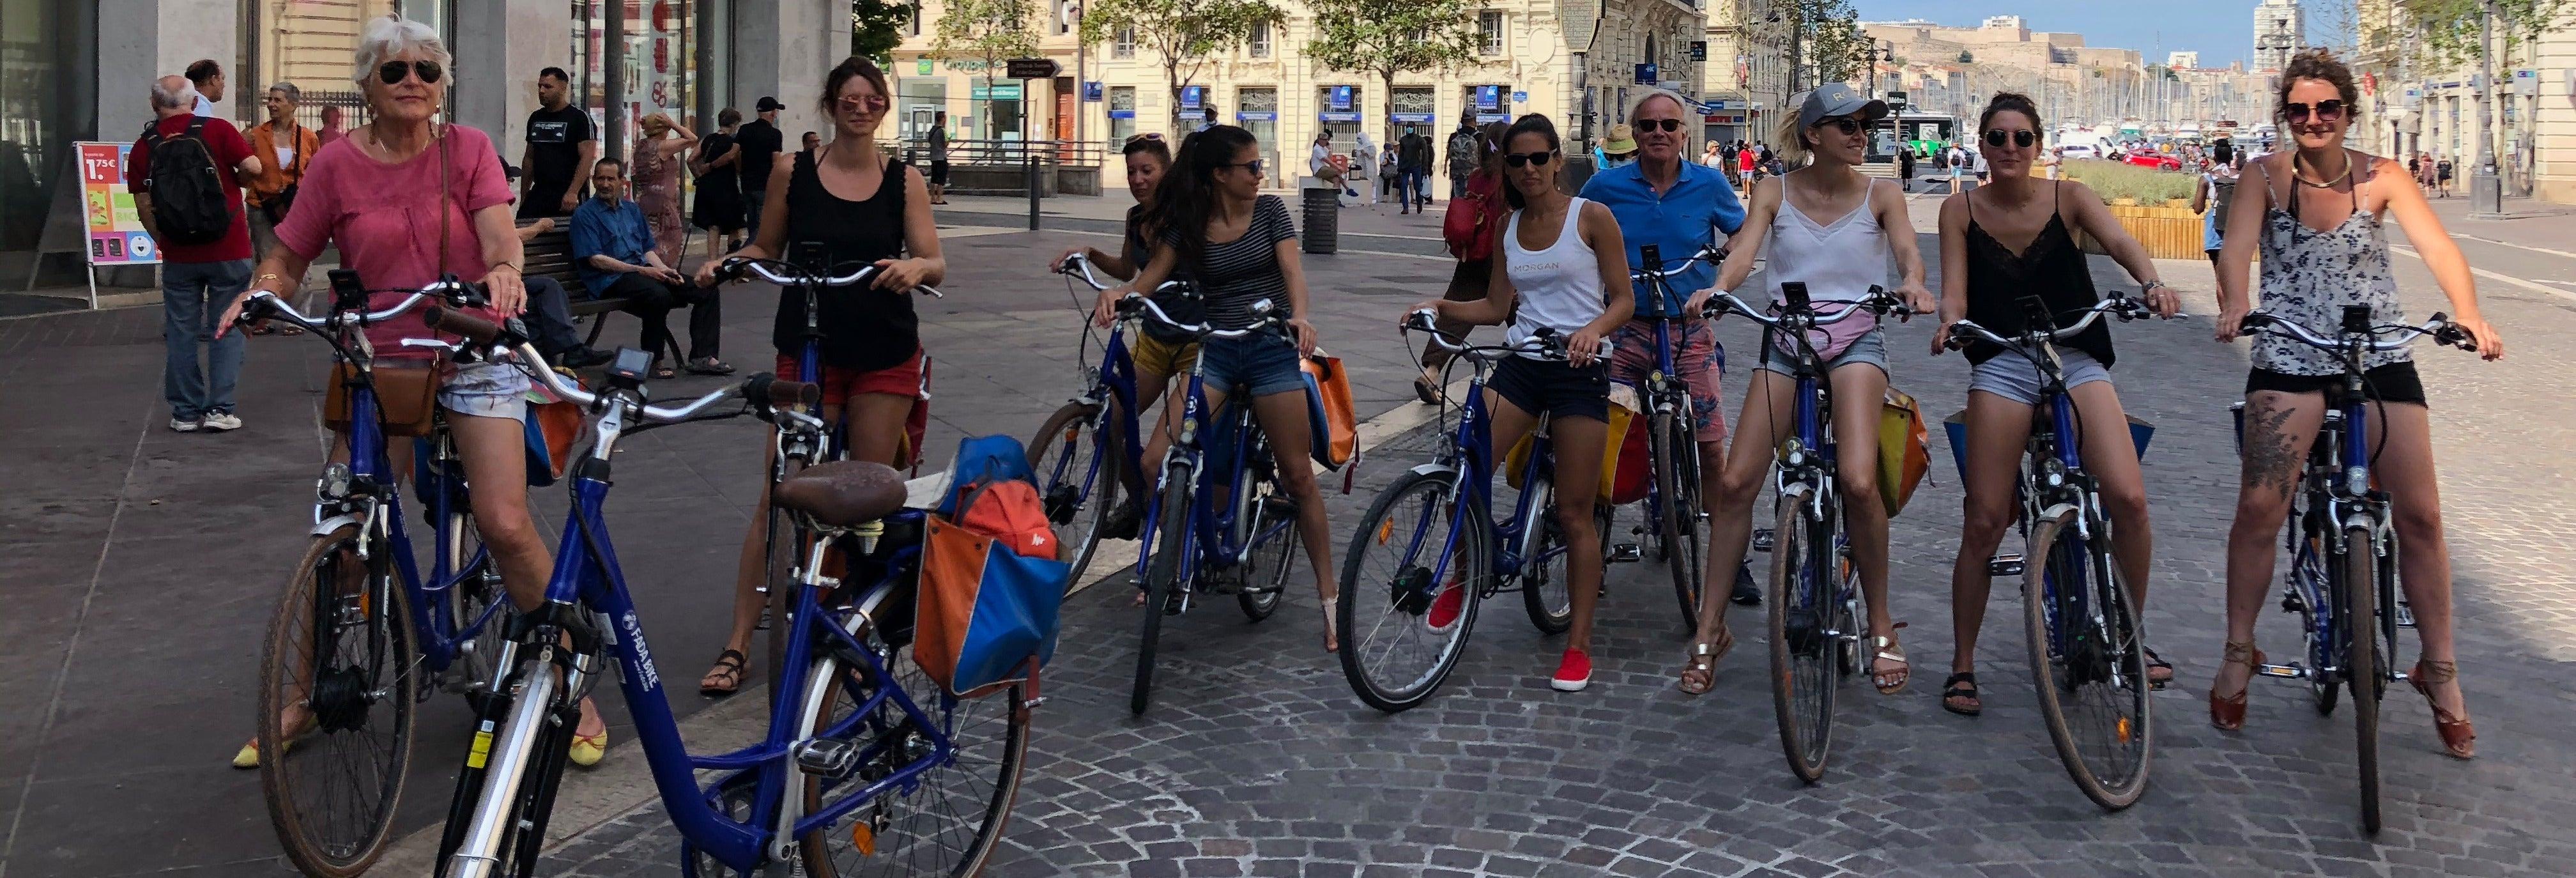 Balade à vélo dans Marseille